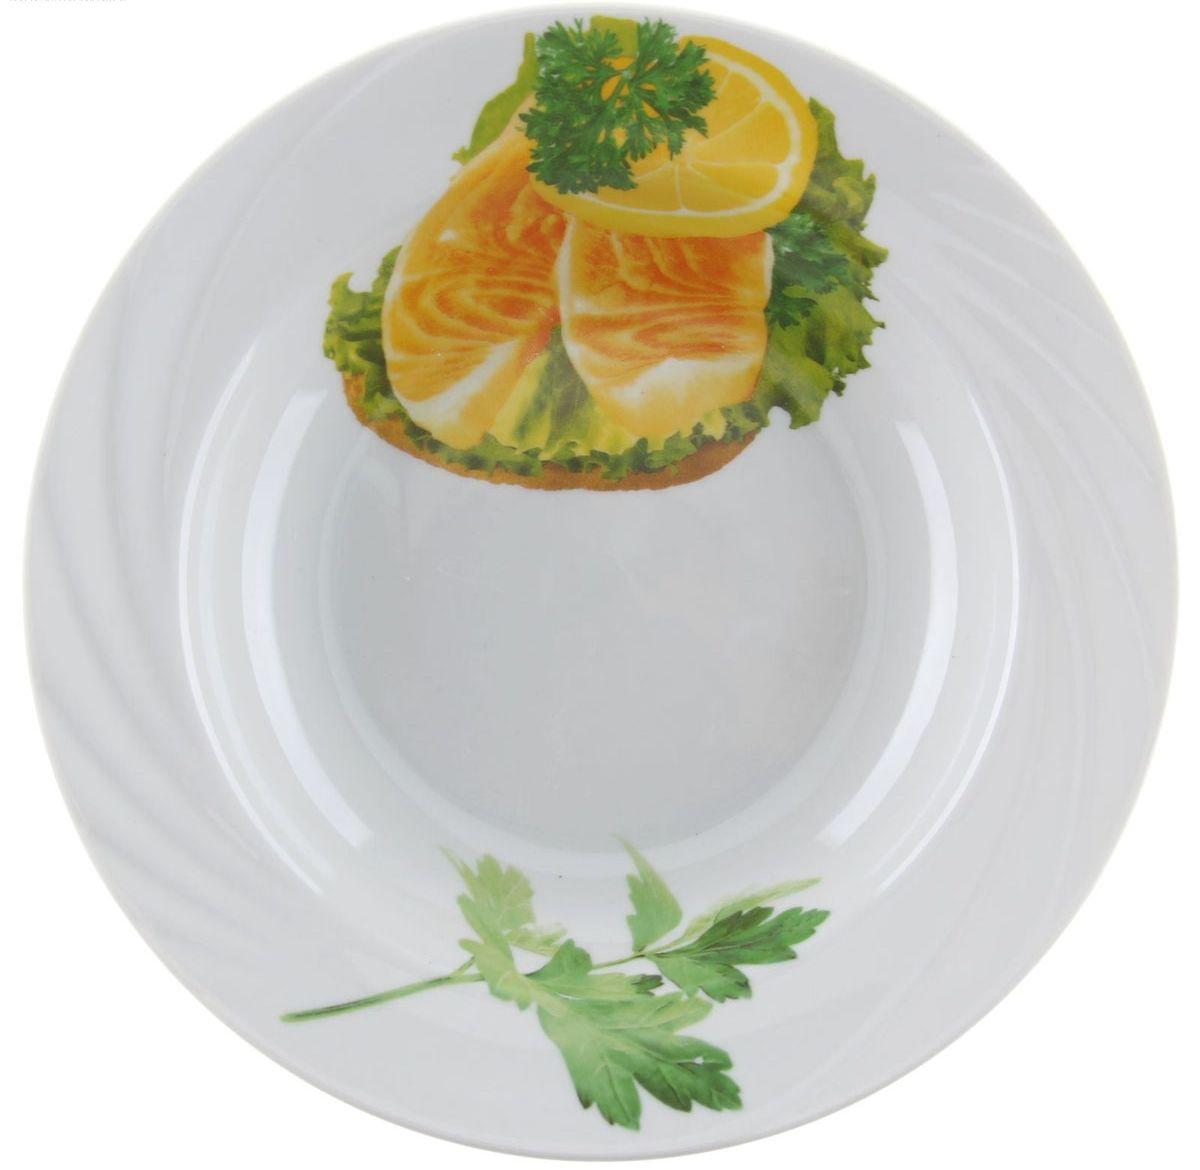 Тарелка глубокая Голубка. Бутерброды, диаметр 20 см селедочница голубка ассорти длина 25 см